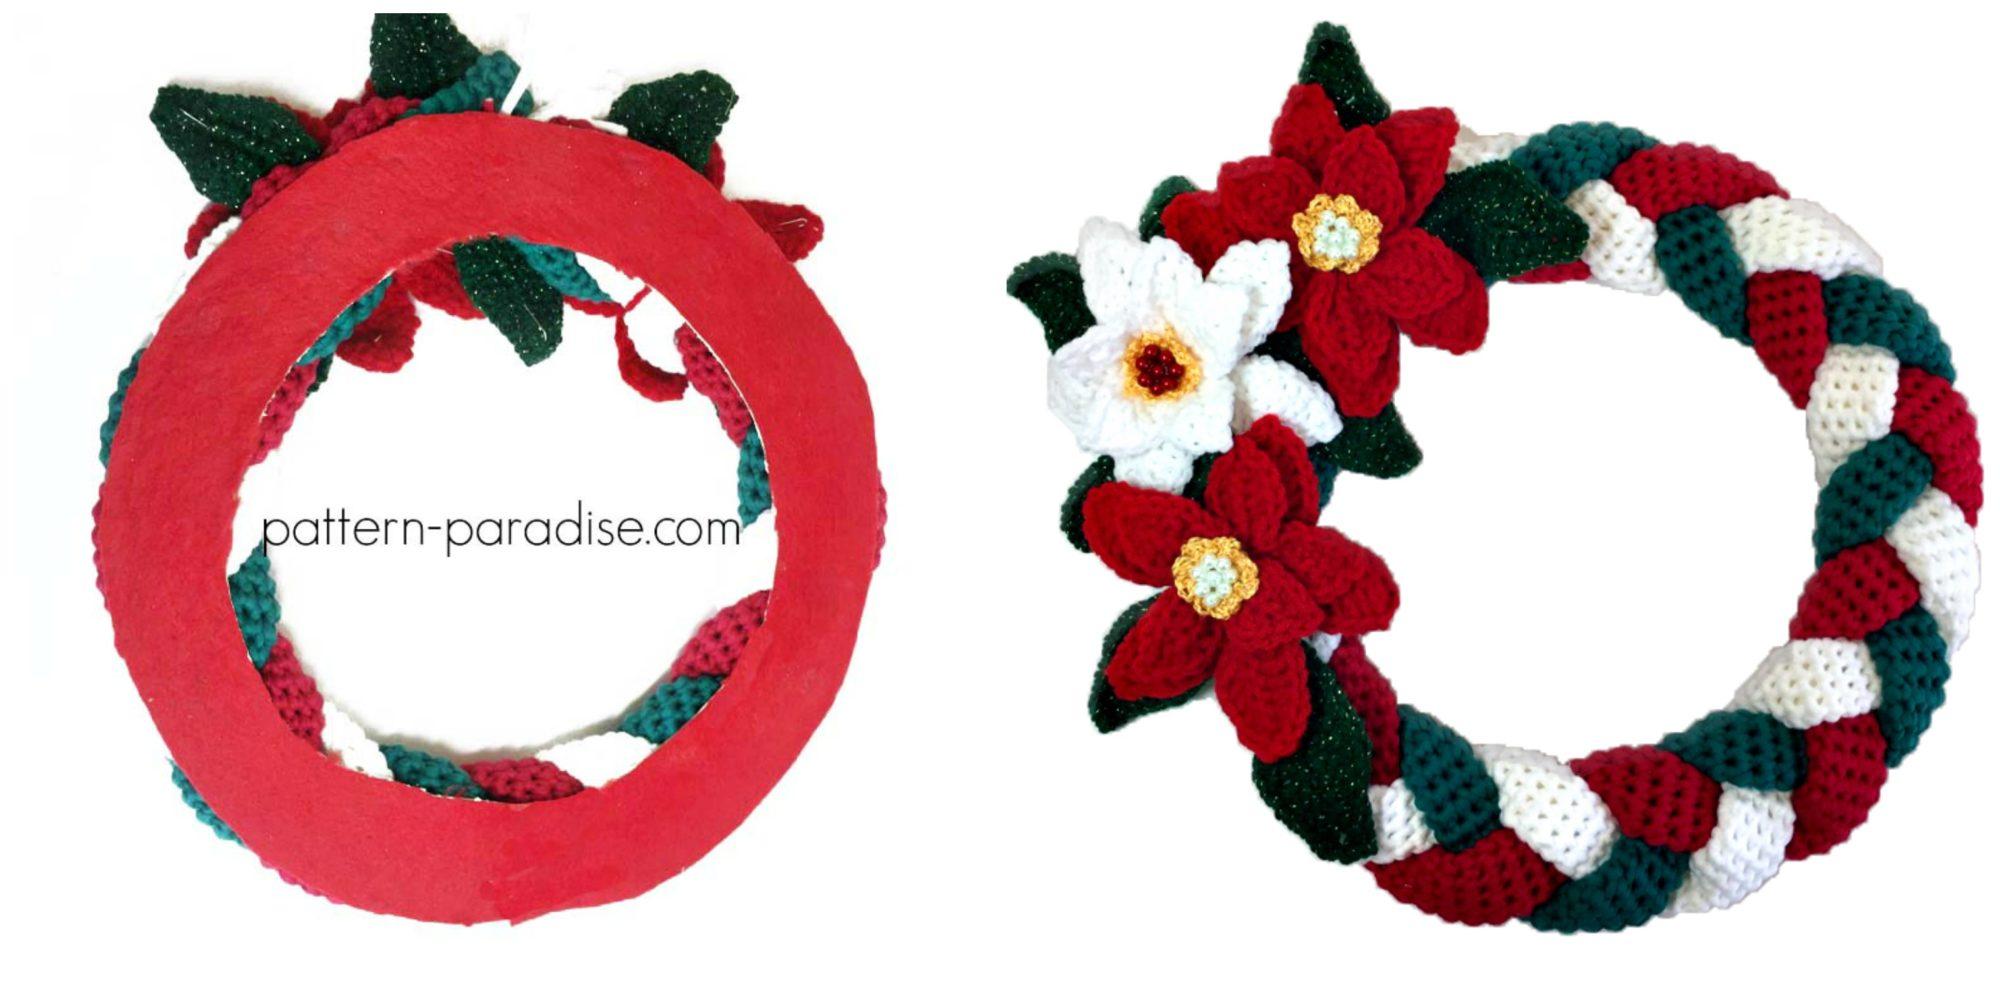 Braided Christmas Wreath 12weekschristmascal Week 4